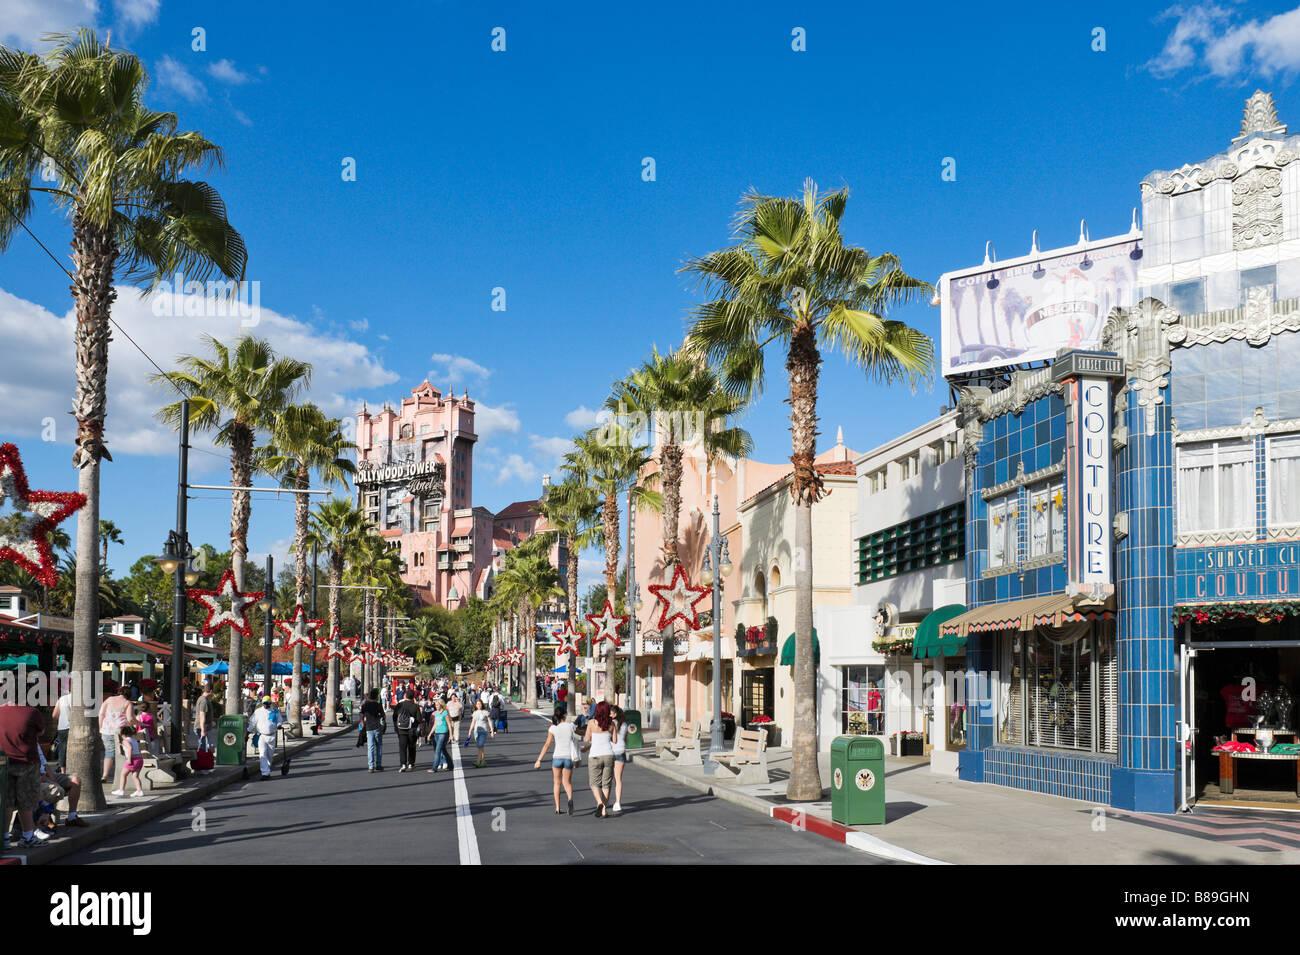 Sunset Boulevard looking towards Twilight Zone Tower of Terror, Disney Hollywood Studios, Walt Disney World, Orlando, - Stock Image